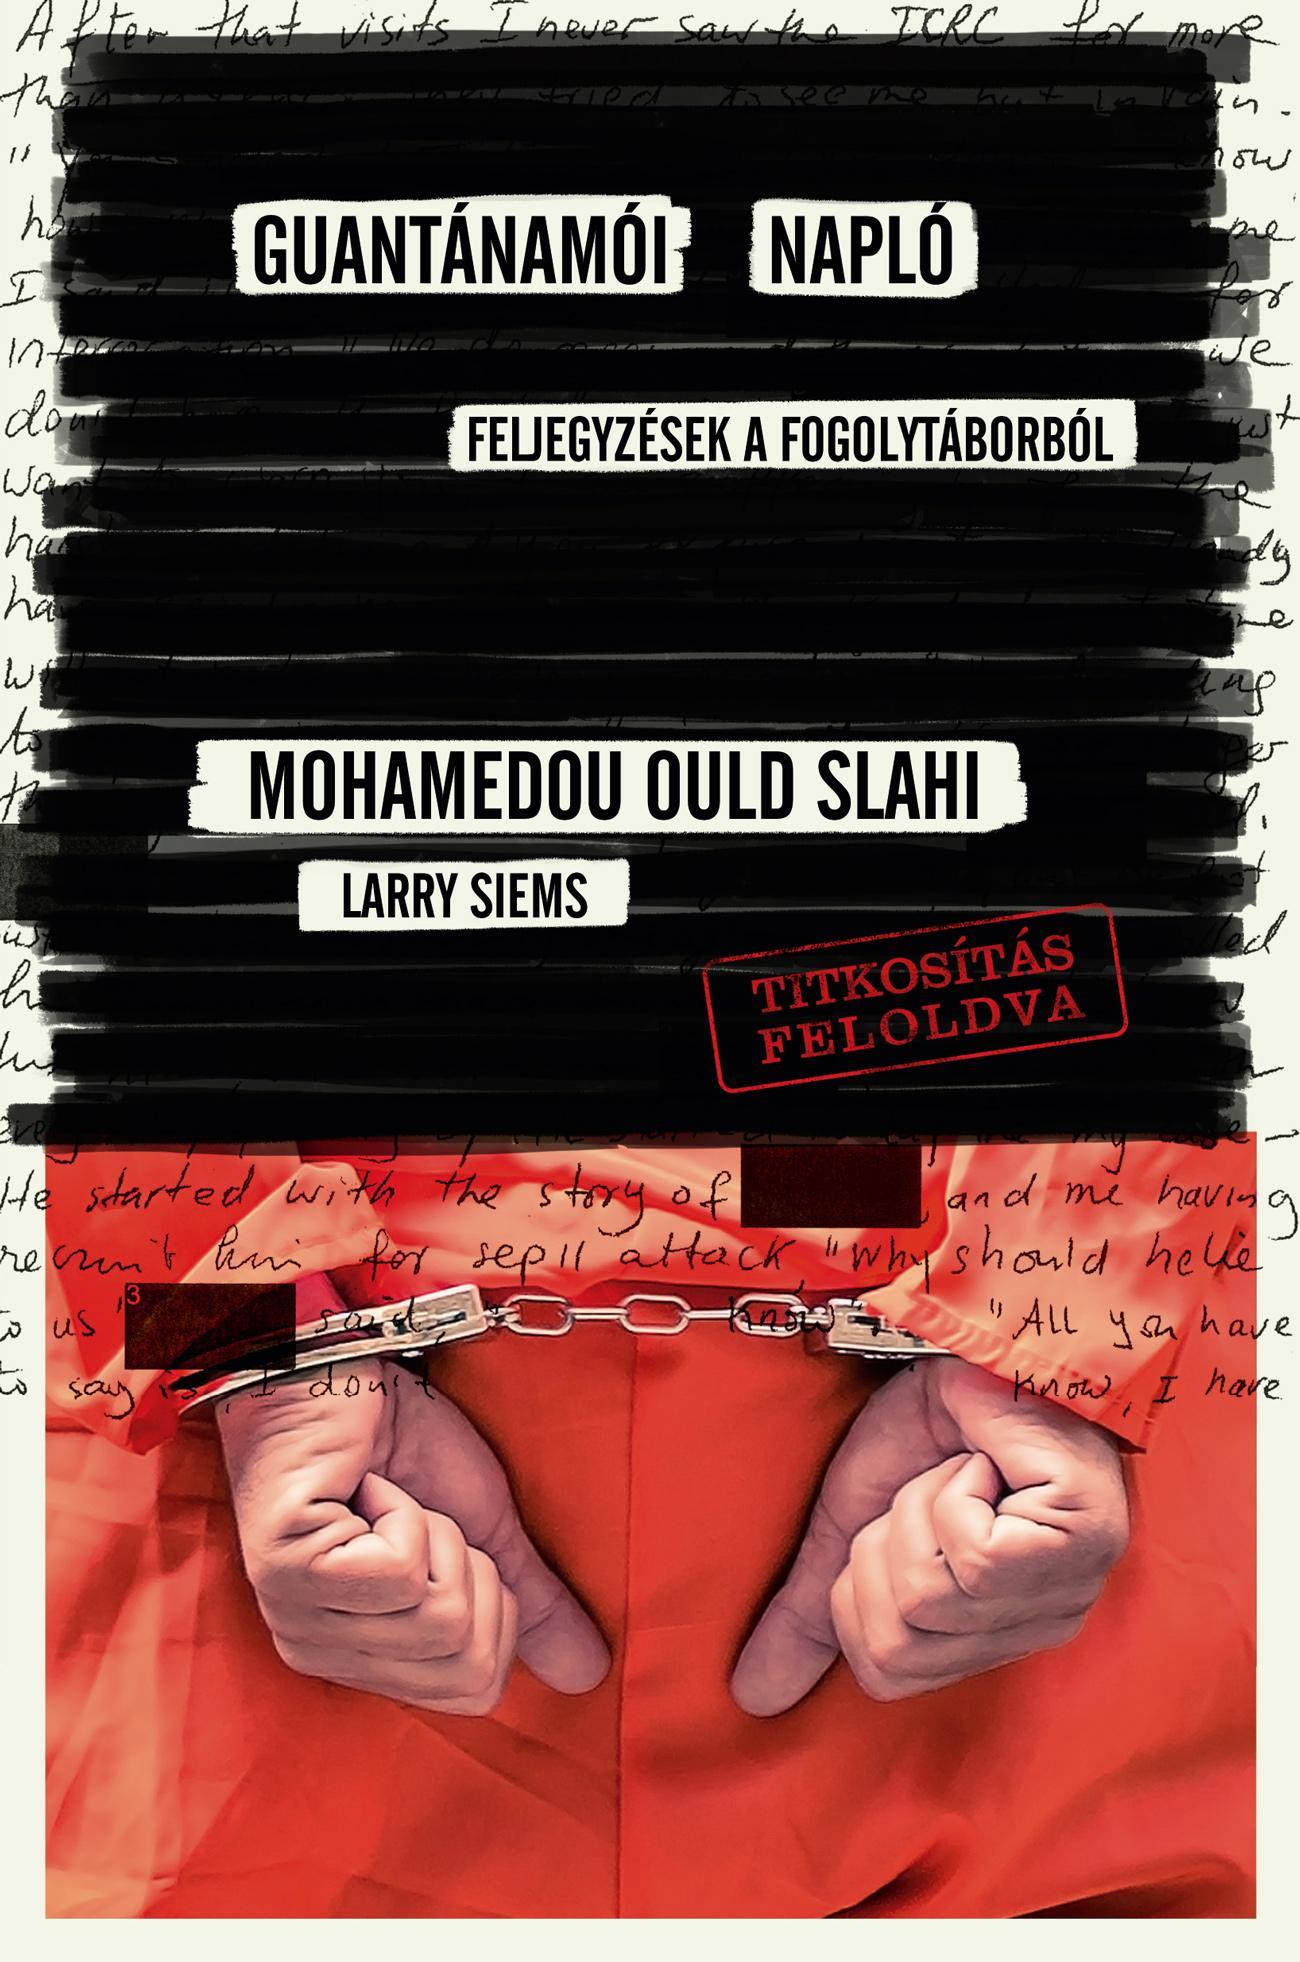 SLAHI, MOHAMEDOU OULD - GUANTÁNAMÓI NAPLÓ